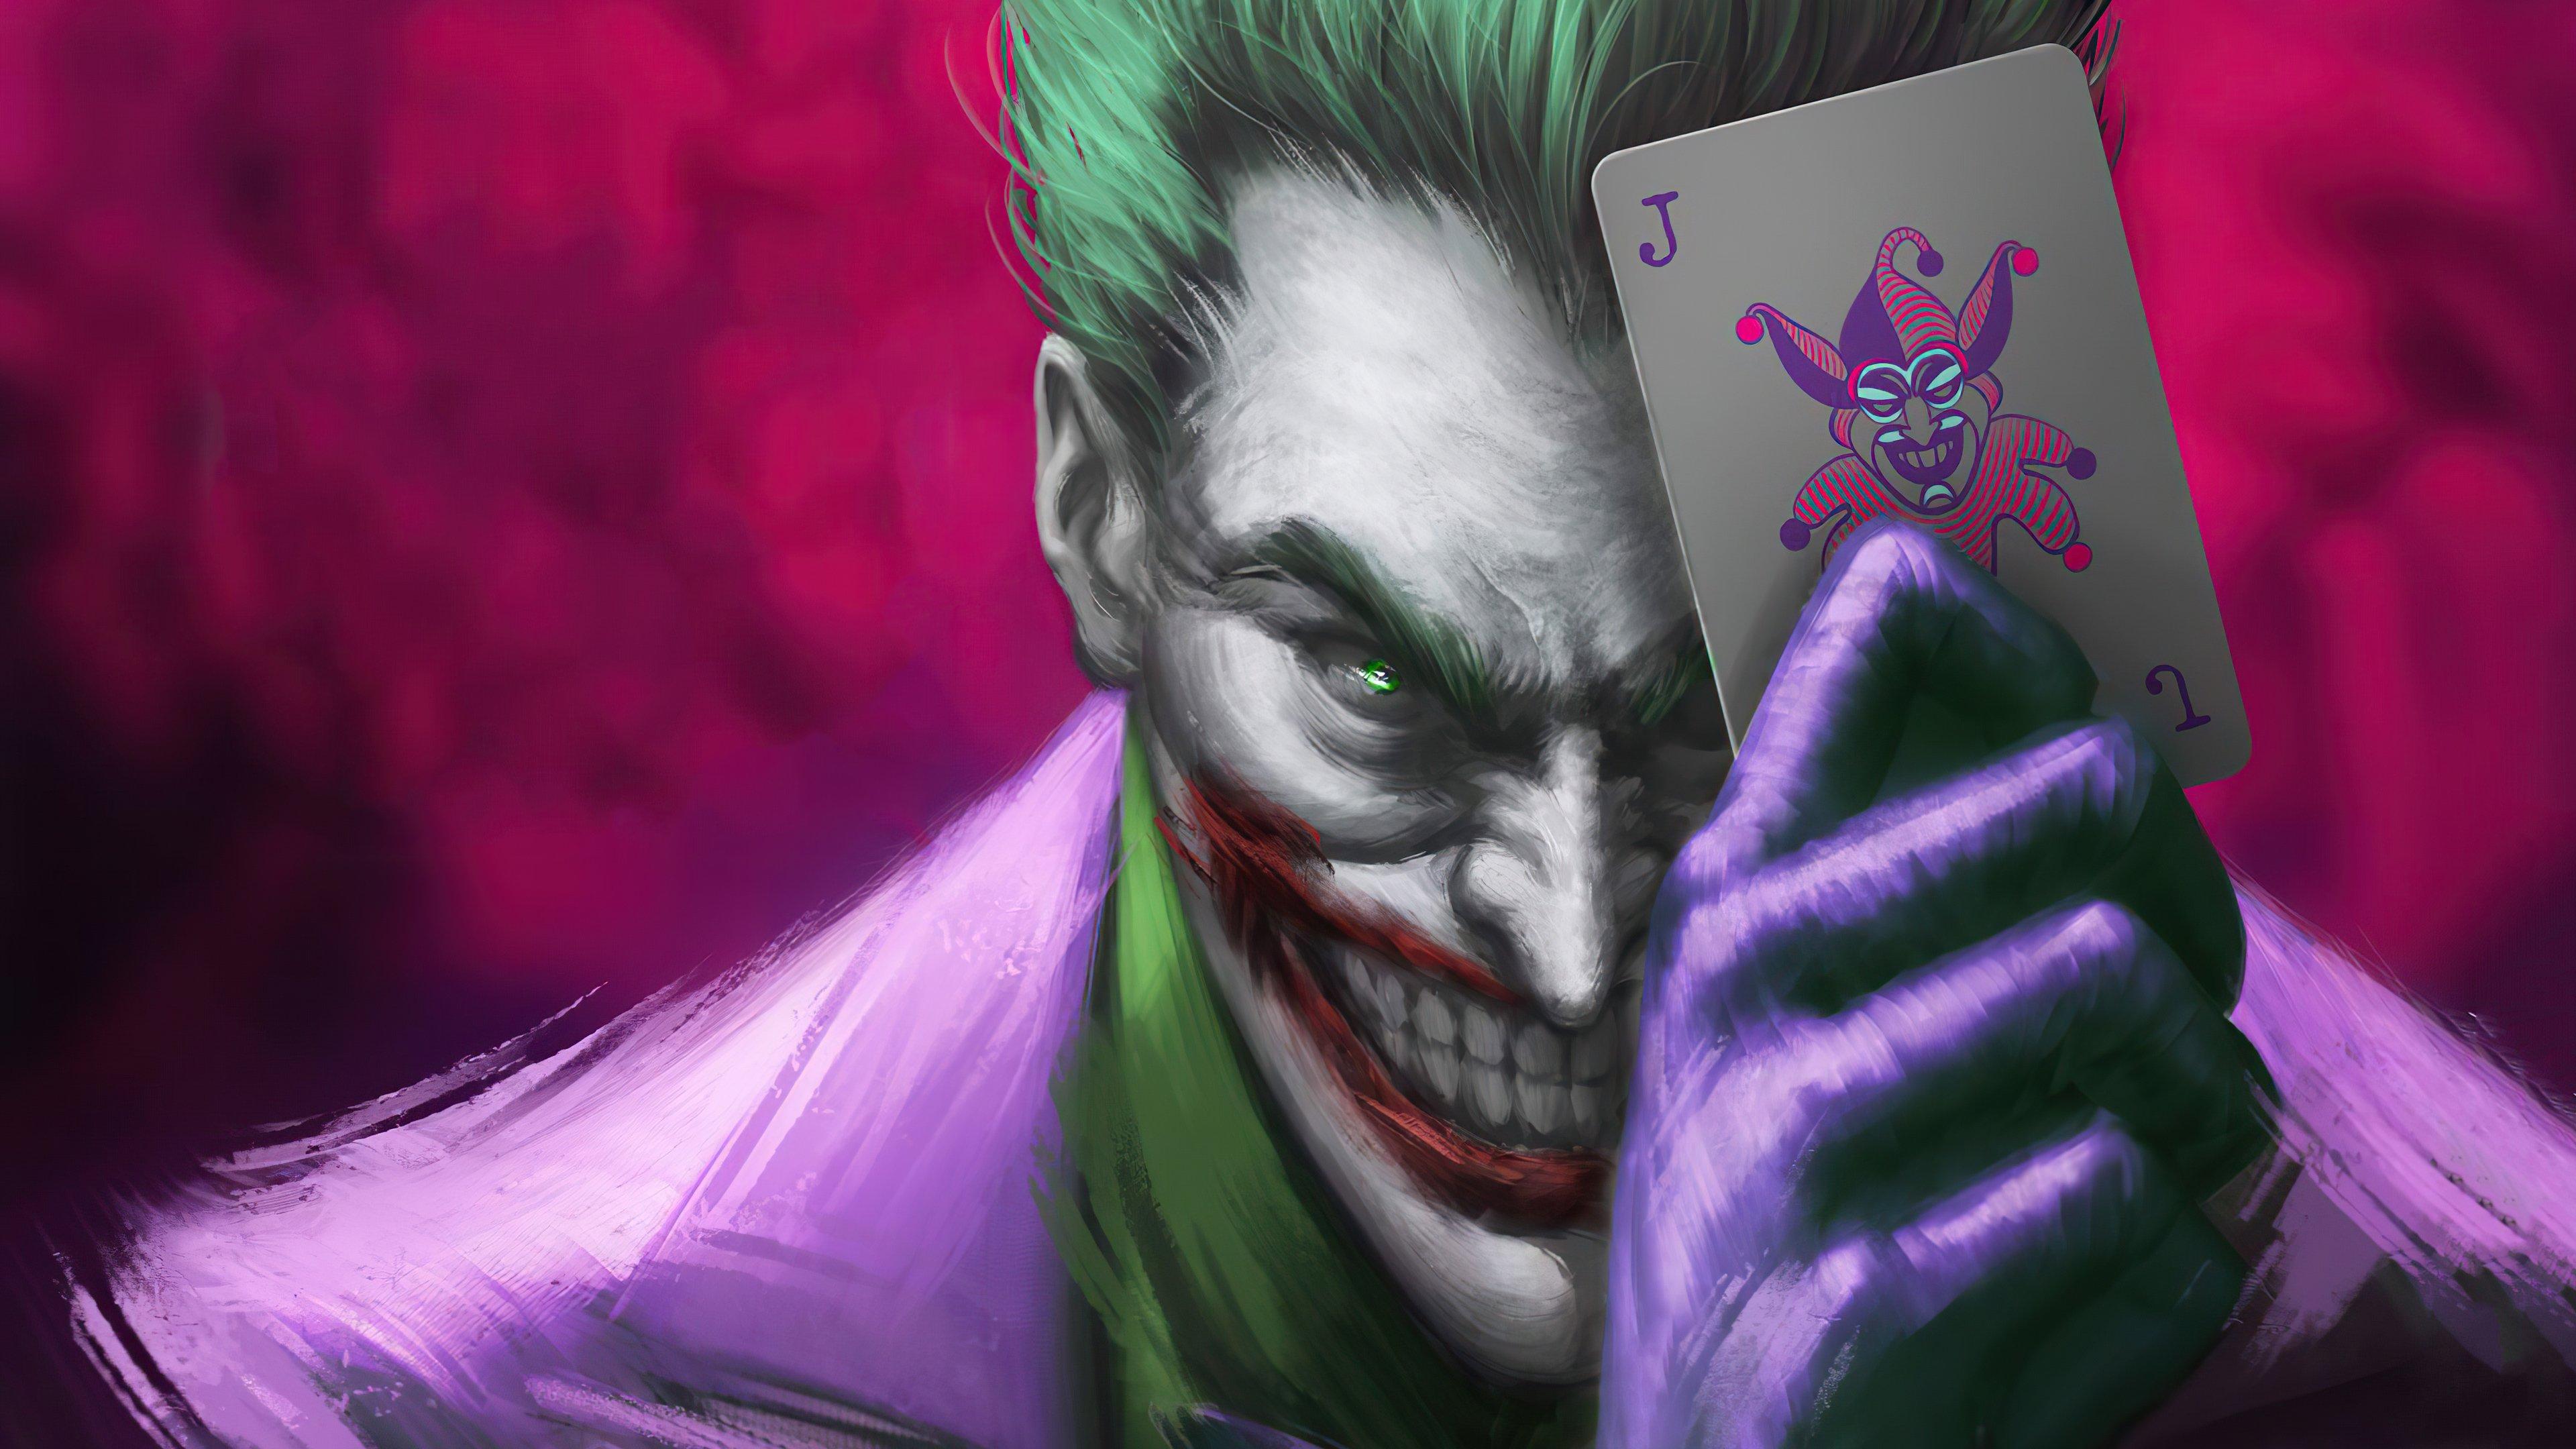 Fondos de pantalla El guasón con carta joker